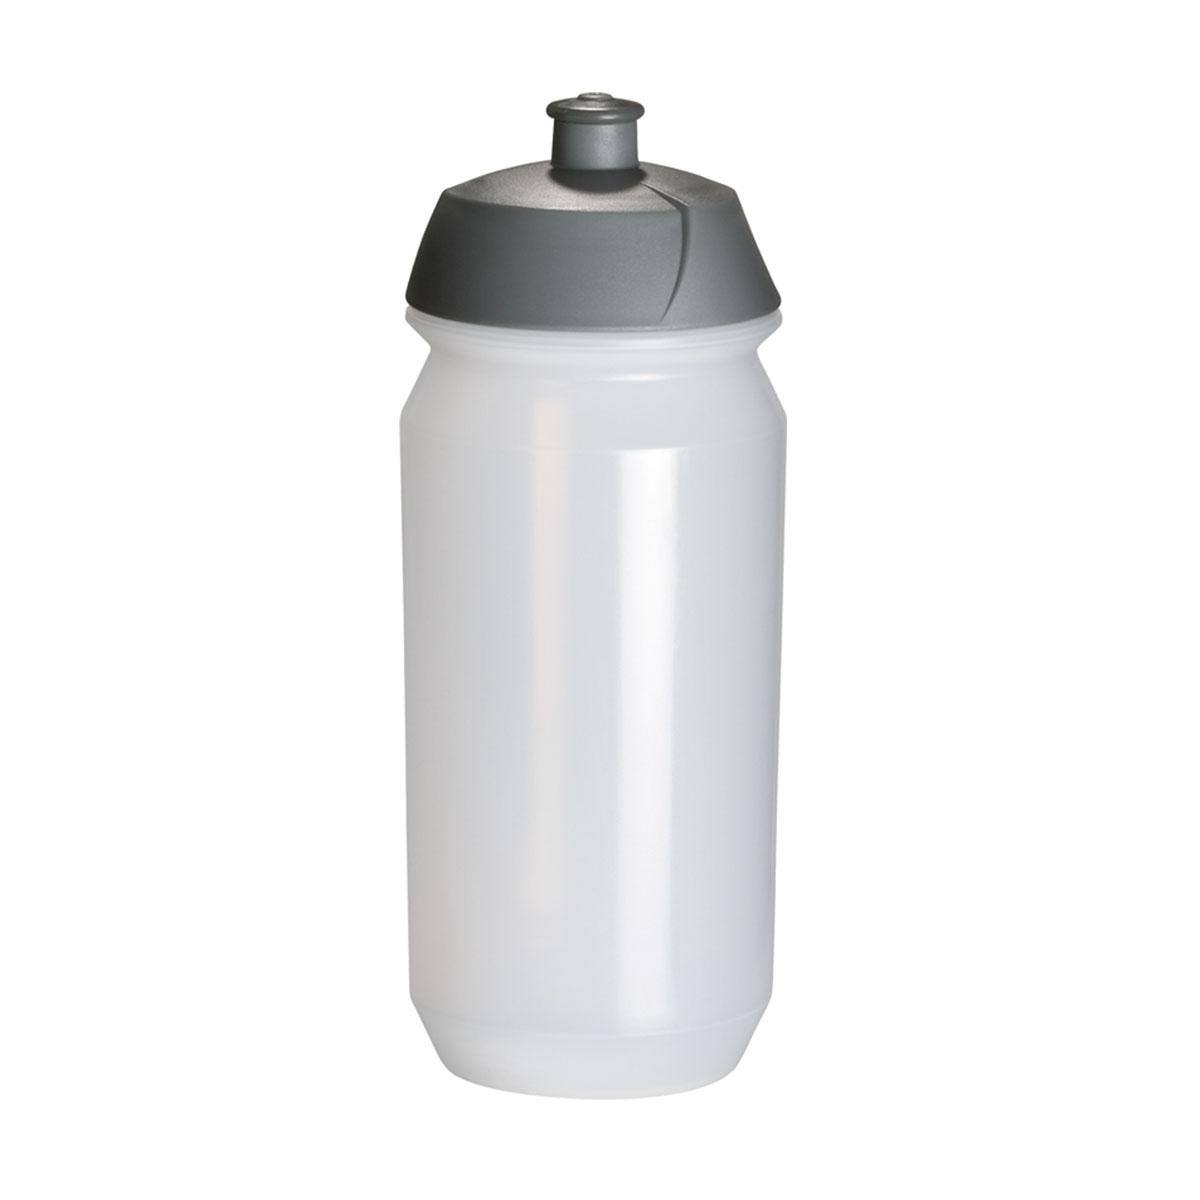 5702 Tacx Shiva 500ml בקבוק לאופניים